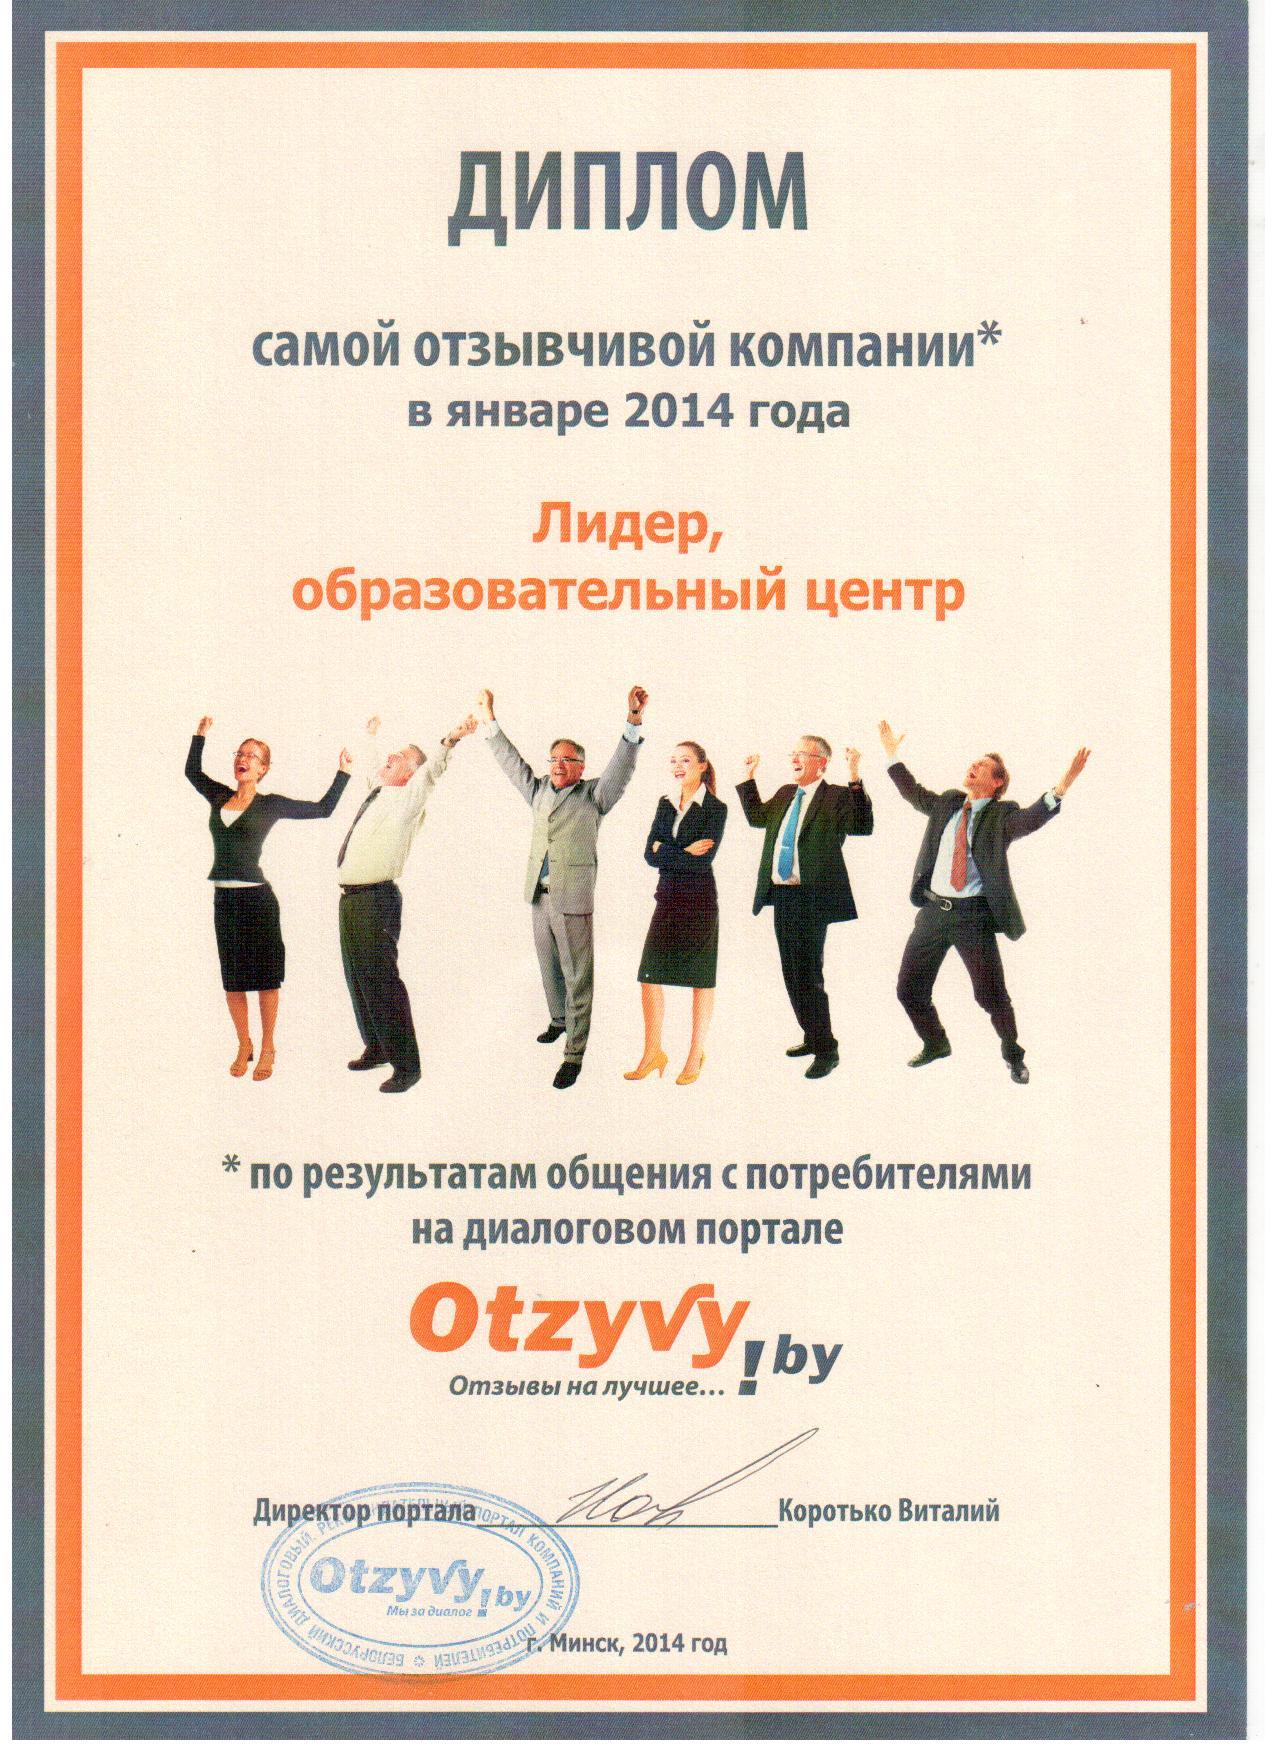 otzyvy.by январь2014